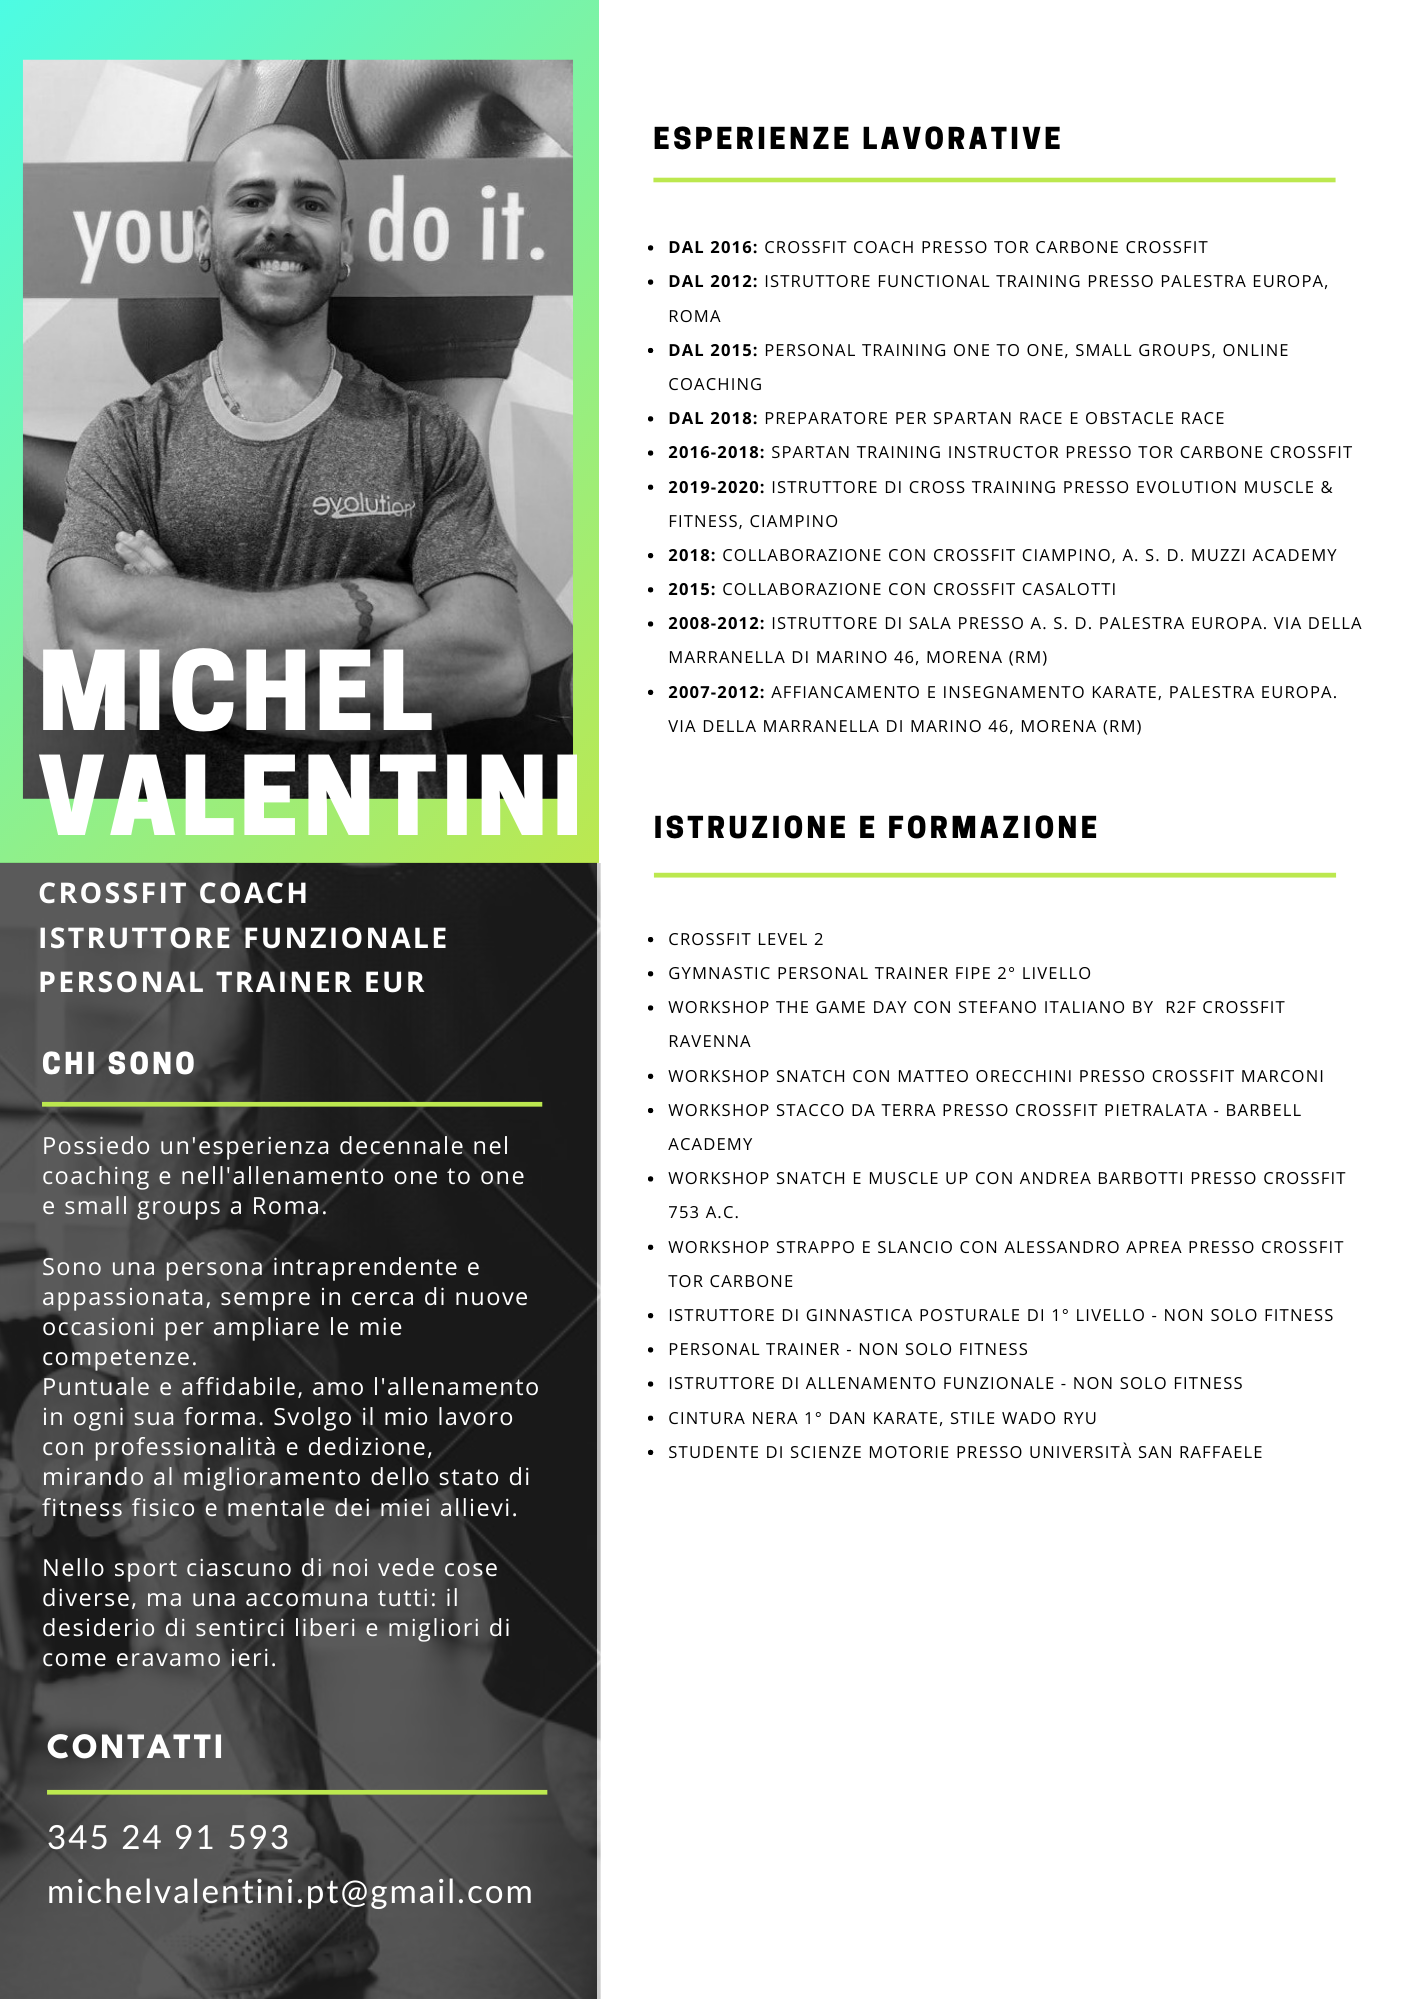 Michel Valentini | Personal Trainer Eur